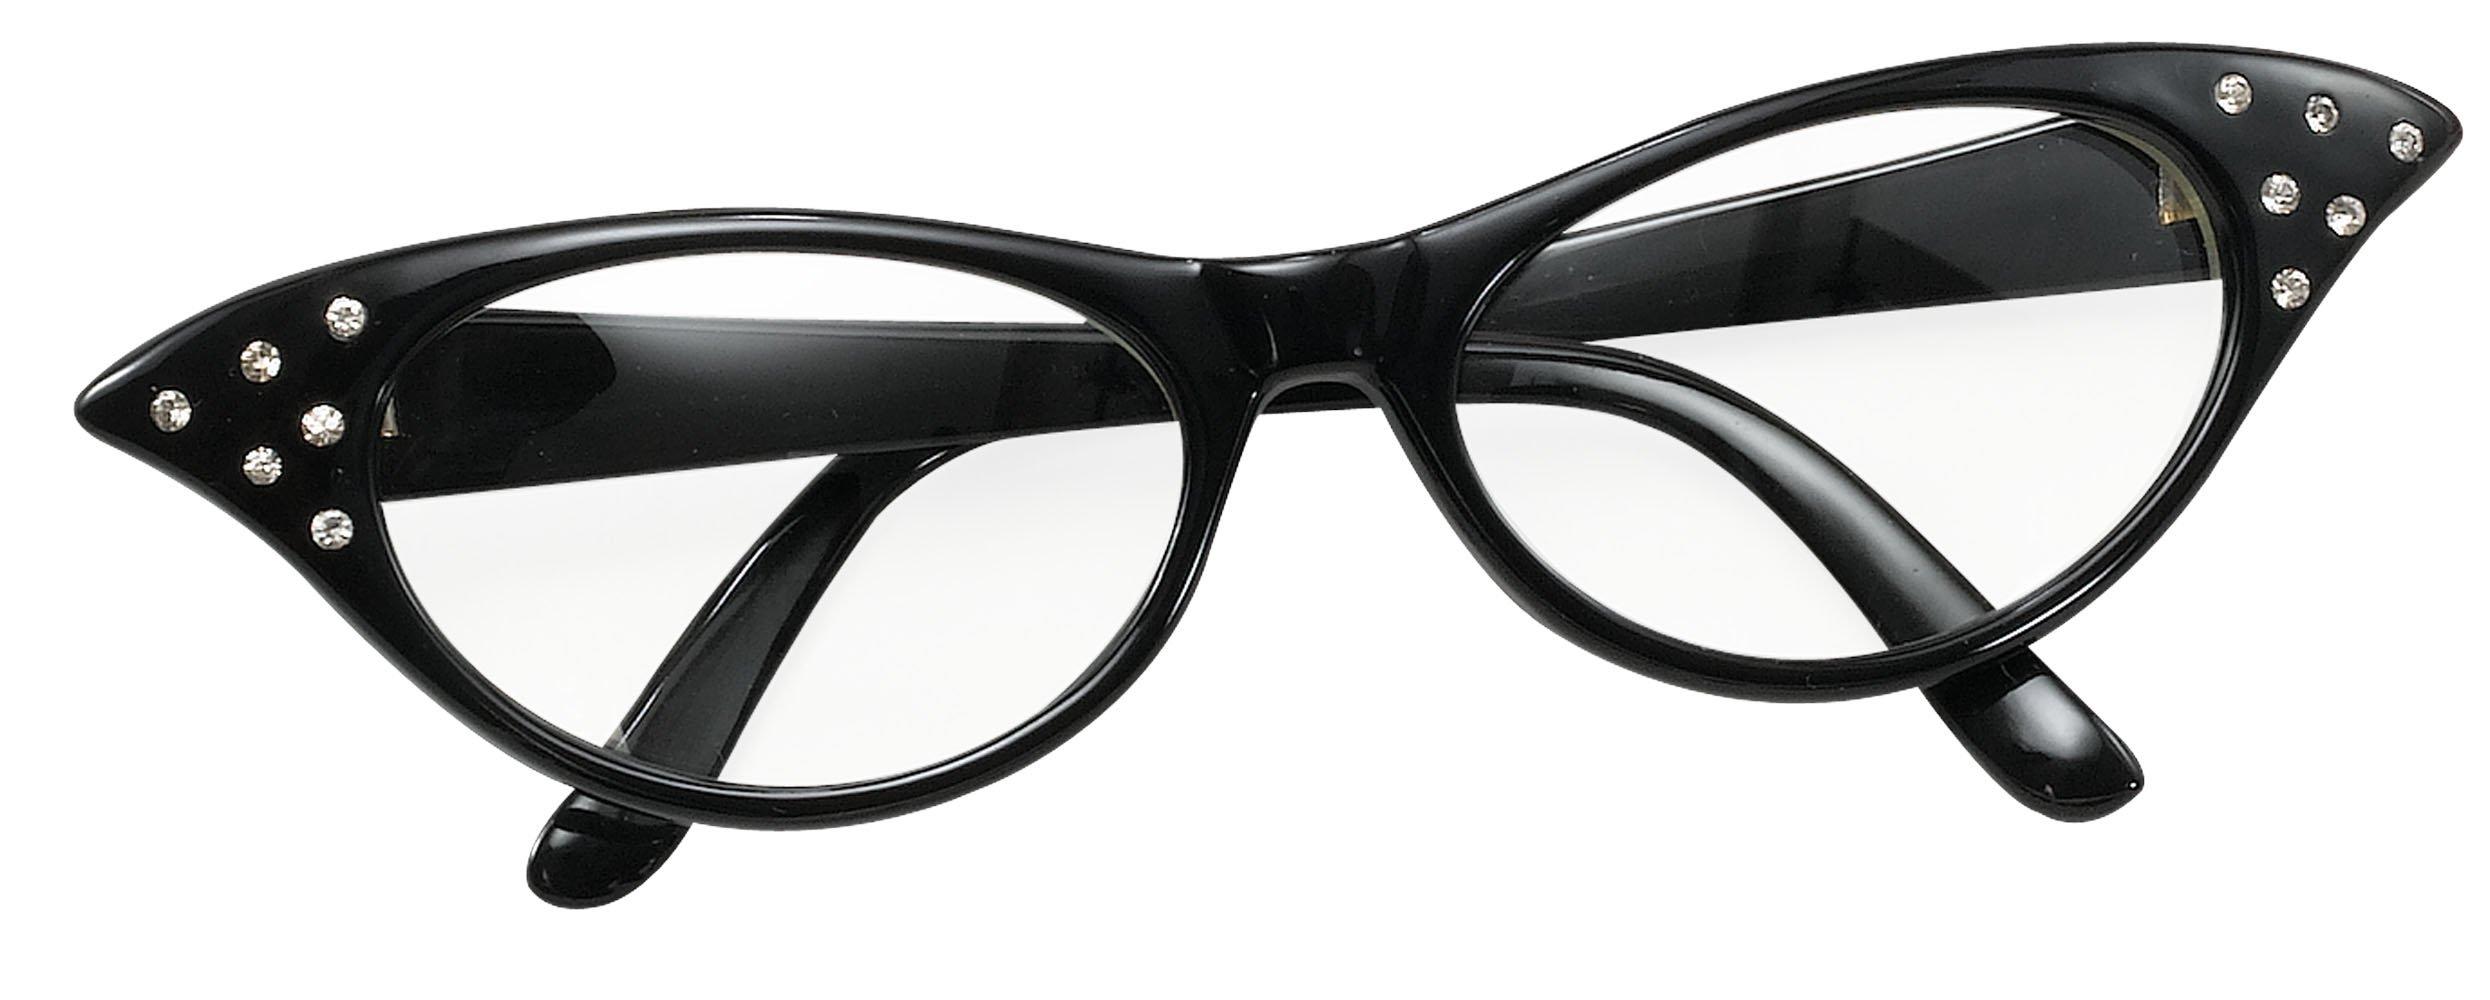 PLAYHOUSE FANCY DRESS Bristol Novelty BA142B Glasses 50's Female Style Black, One Size